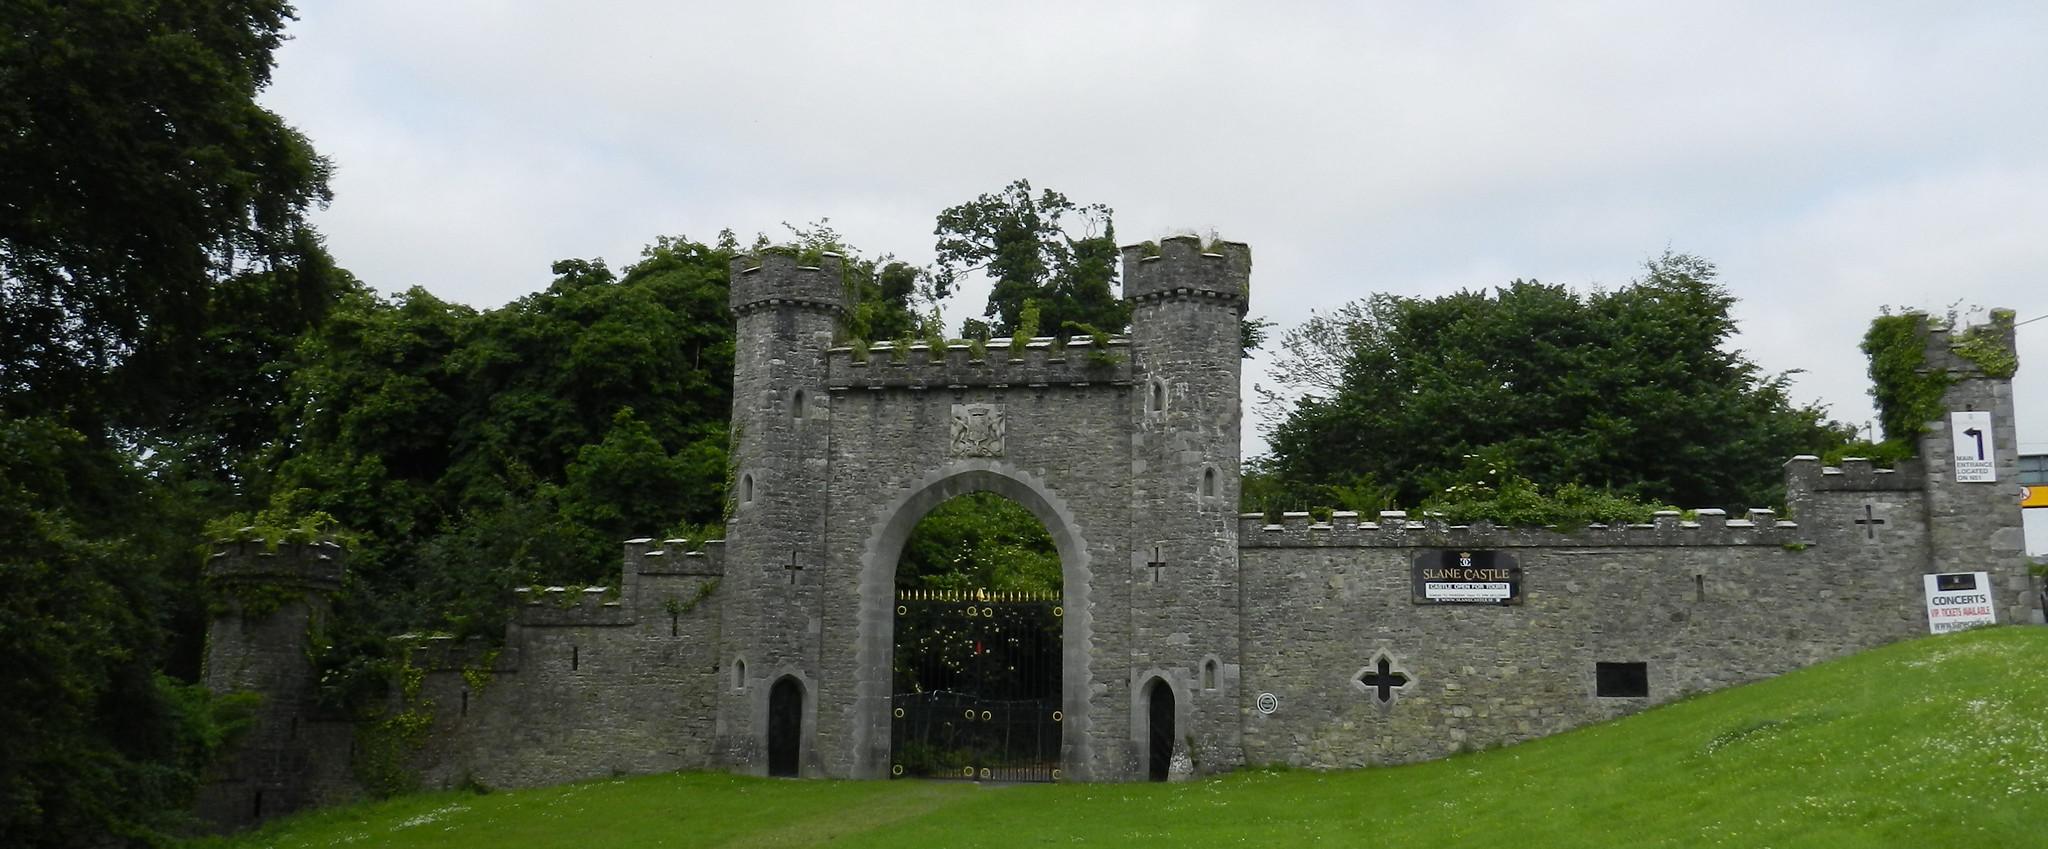 Castillo Slane Belfast Ulster Irlanda del Norte